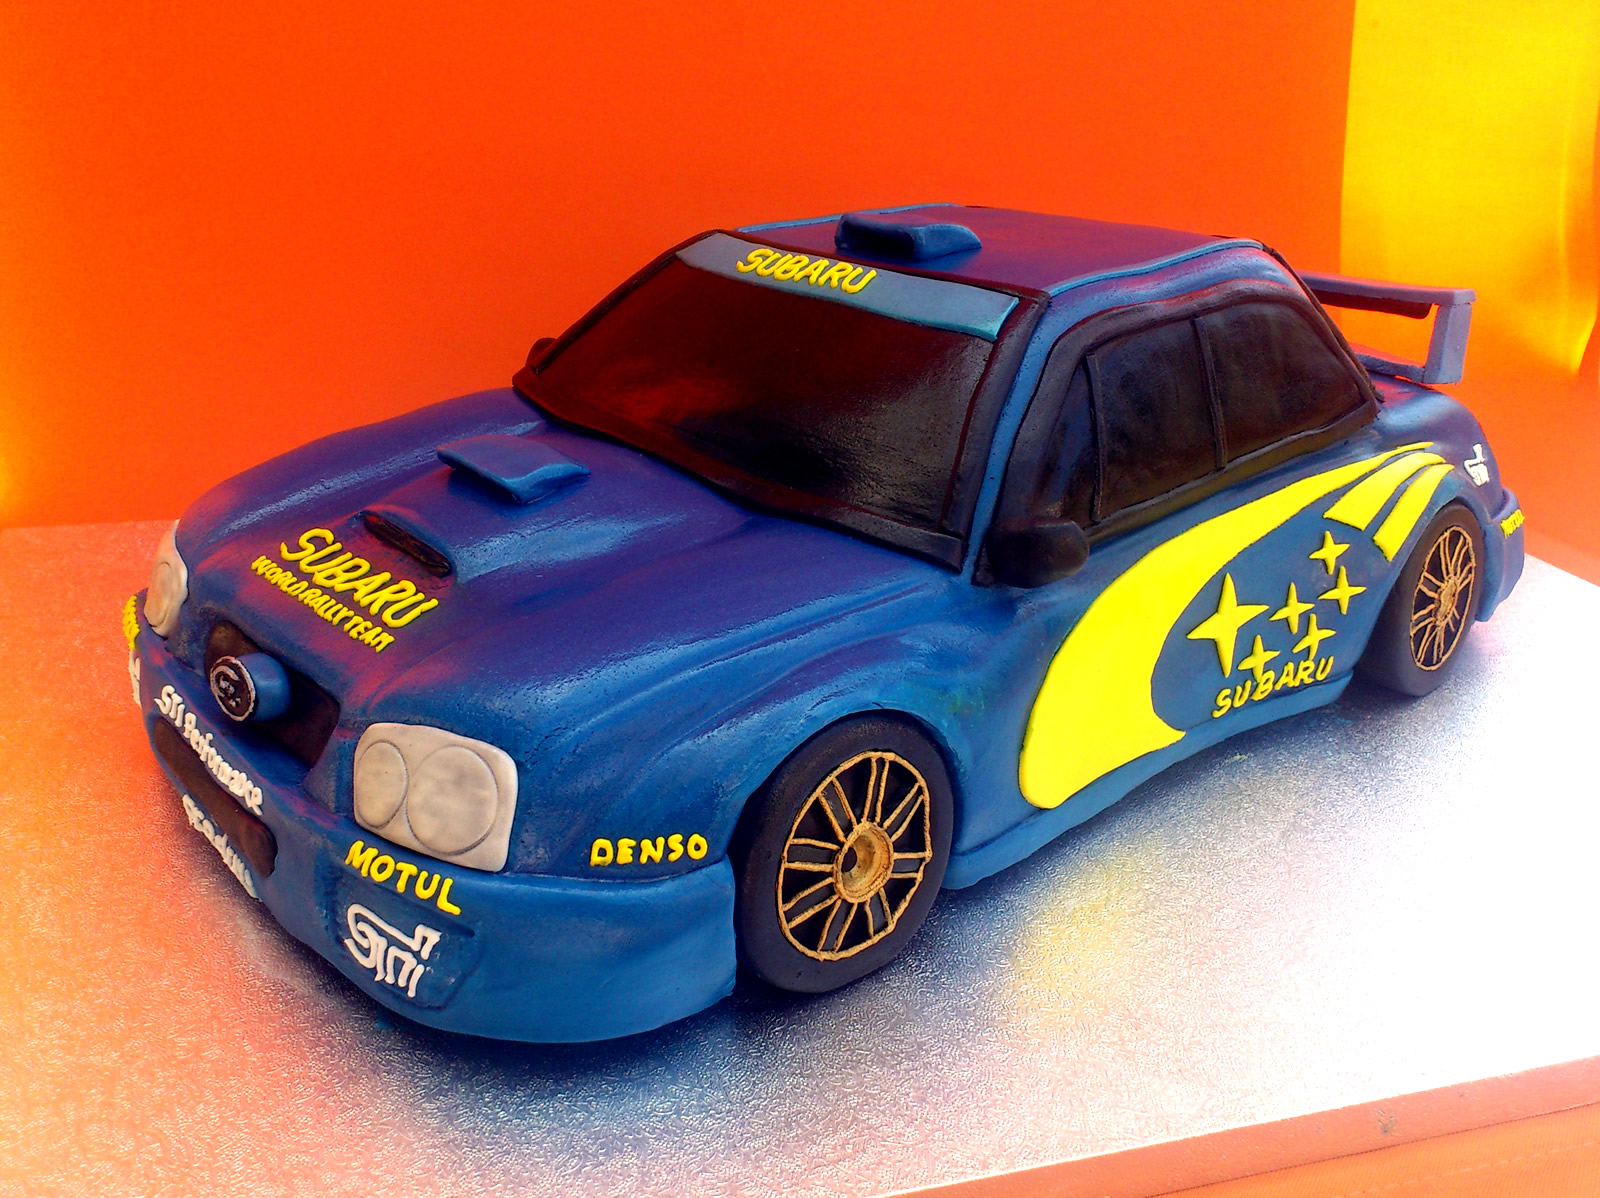 Blue And Yellow Subaru Rally Car Novelty Cake 171 Susie S Cakes